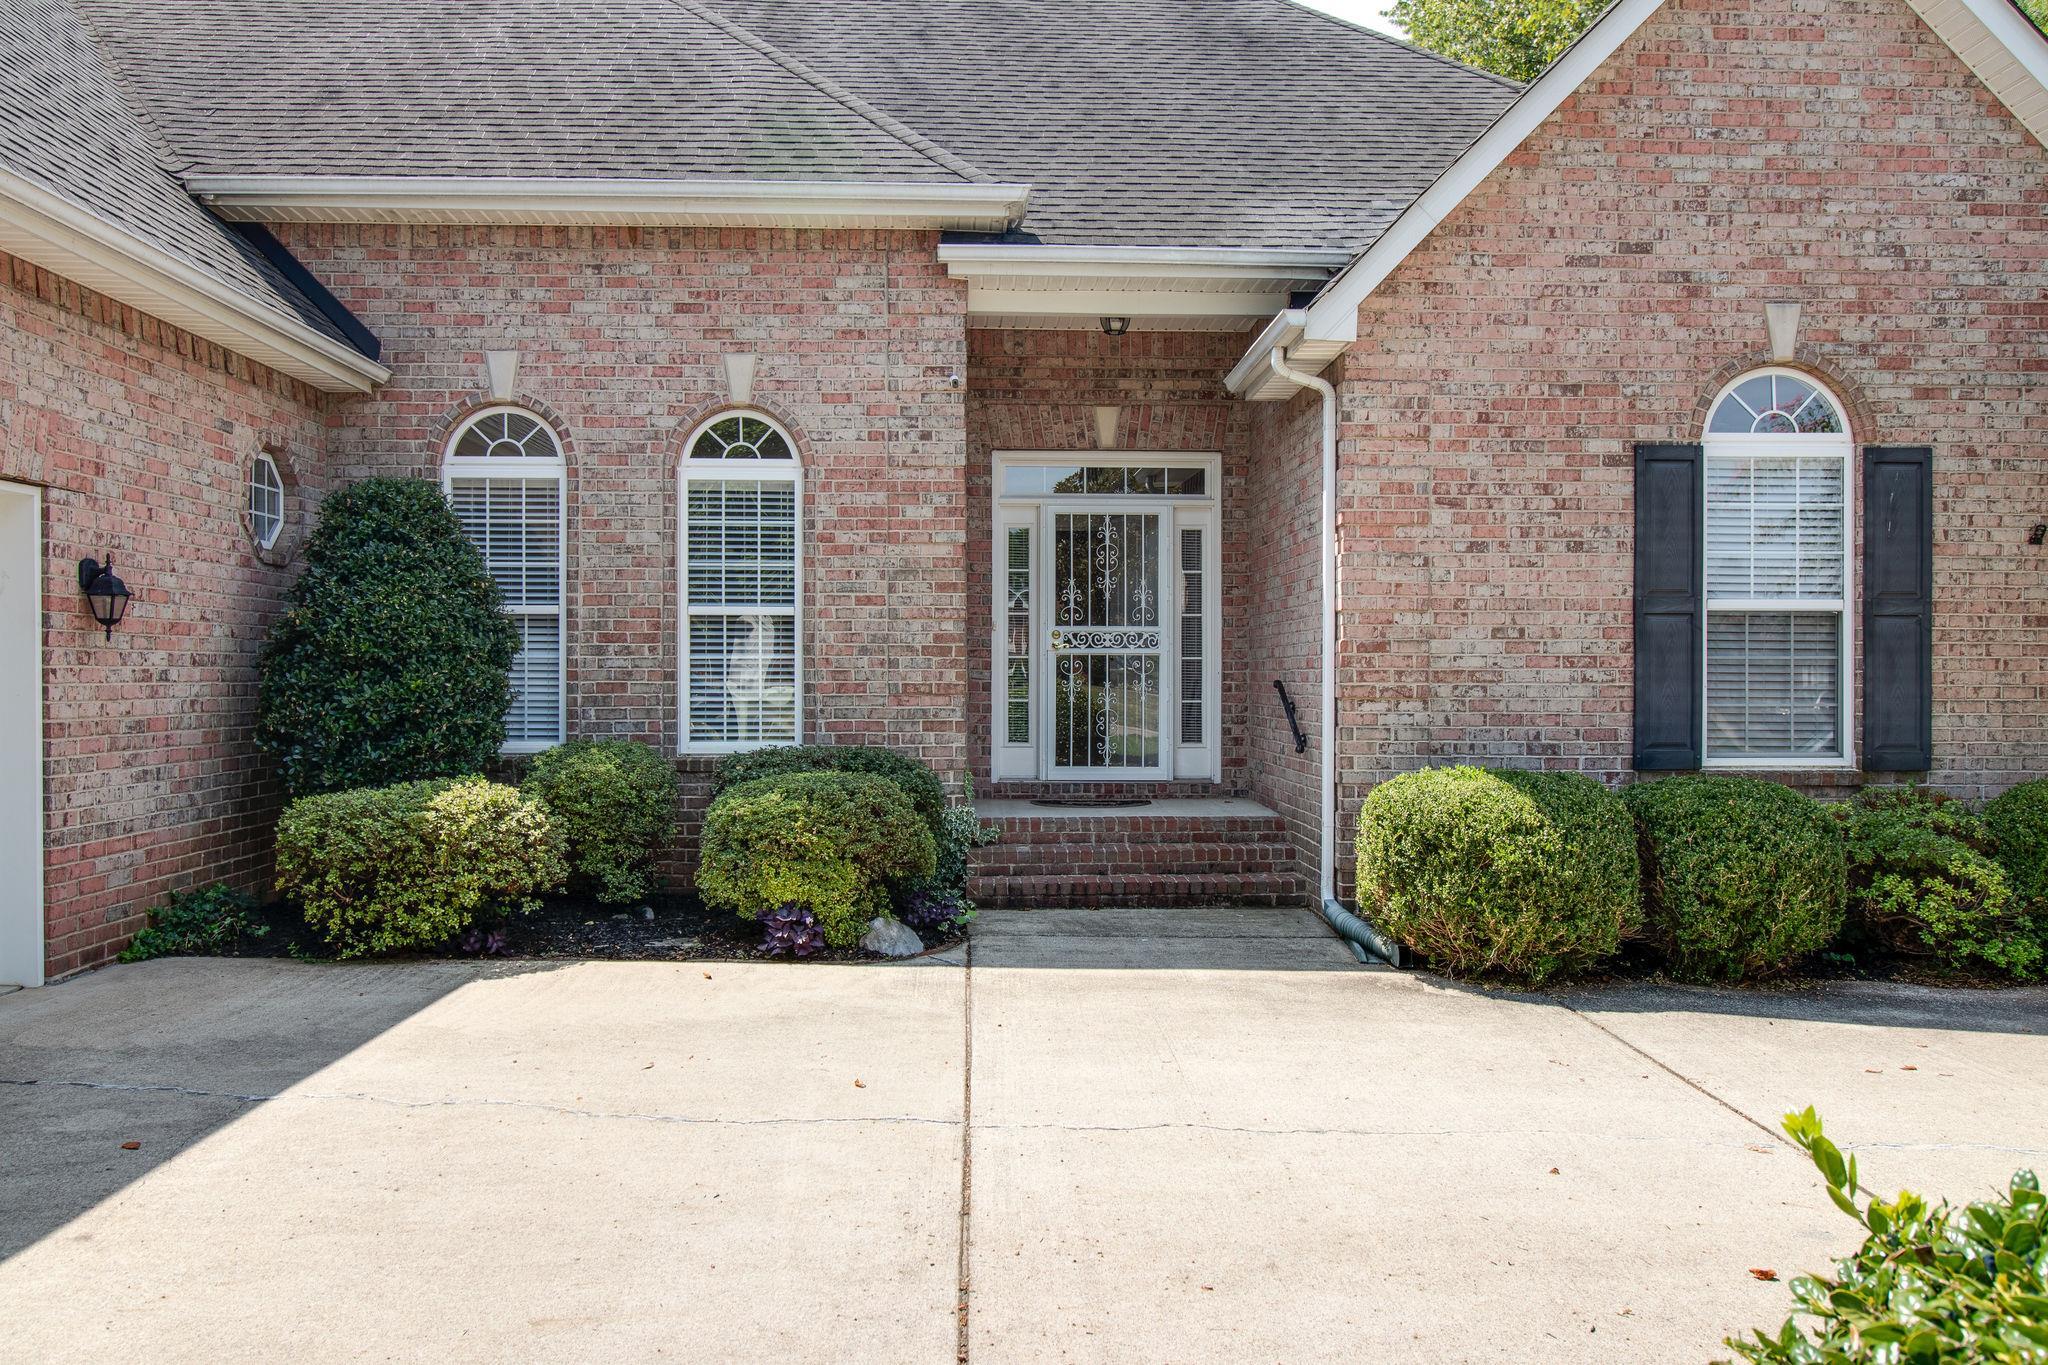 354 Sayre Ln, Murfreesboro, TN 37127 - Murfreesboro, TN real estate listing